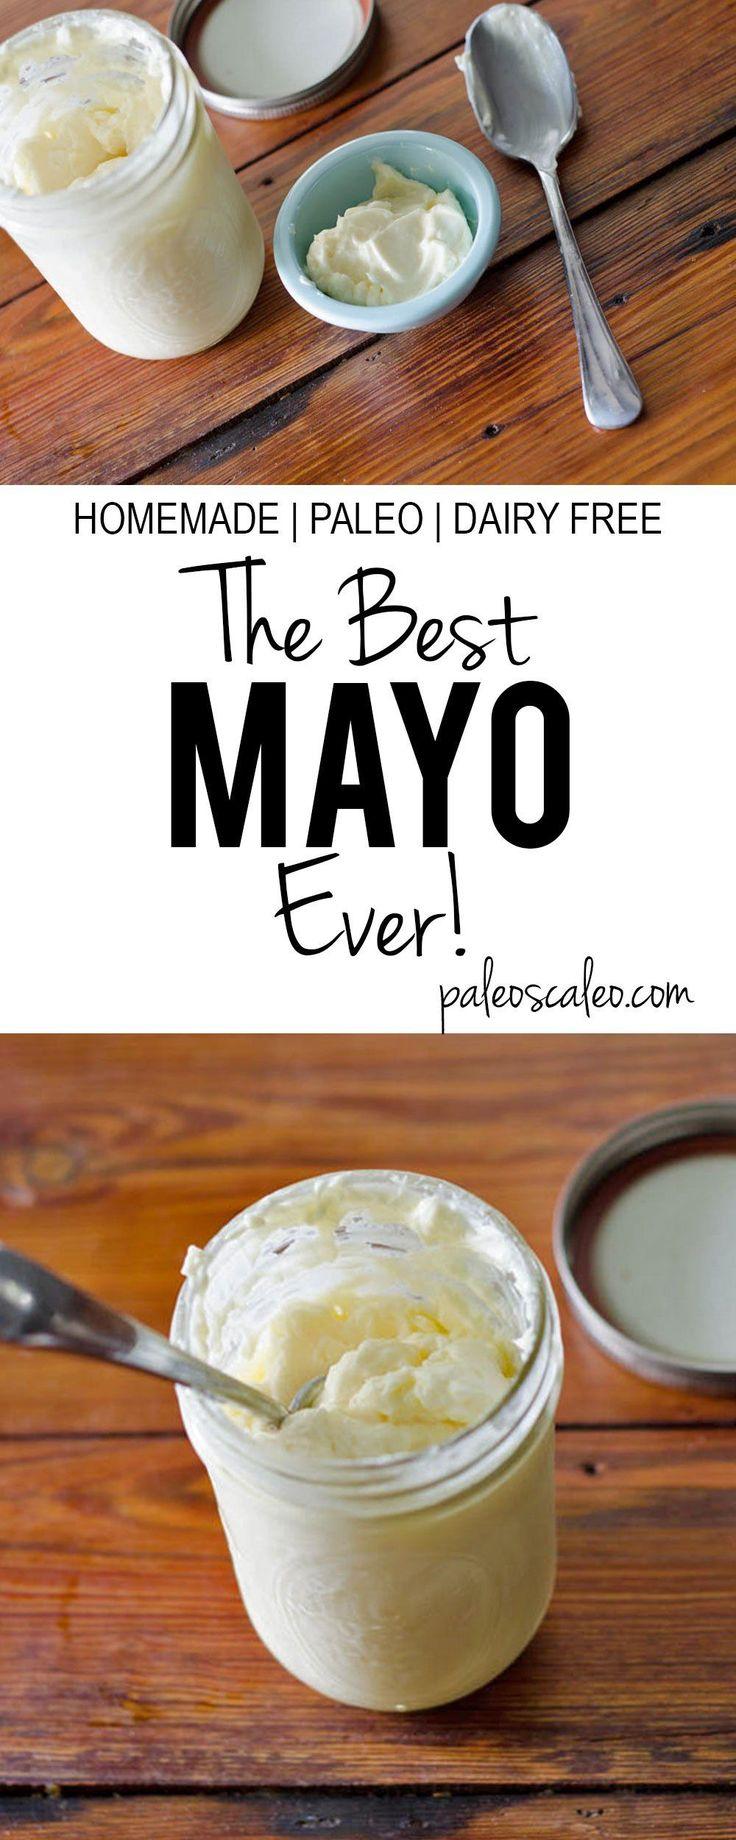 The Best Mayo Ever |  Paleo AND Dairy Free!!! PaleoScaleo.com